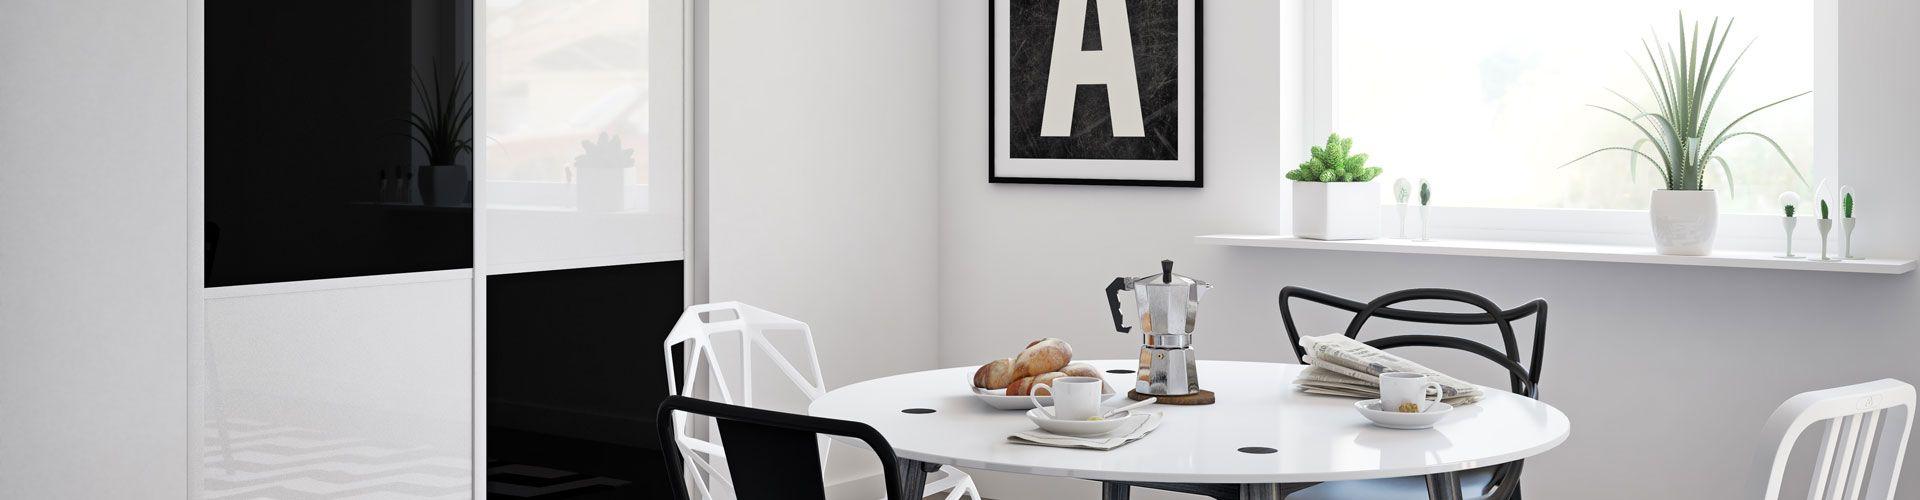 portes de placard d co kazed page 61 kazed. Black Bedroom Furniture Sets. Home Design Ideas